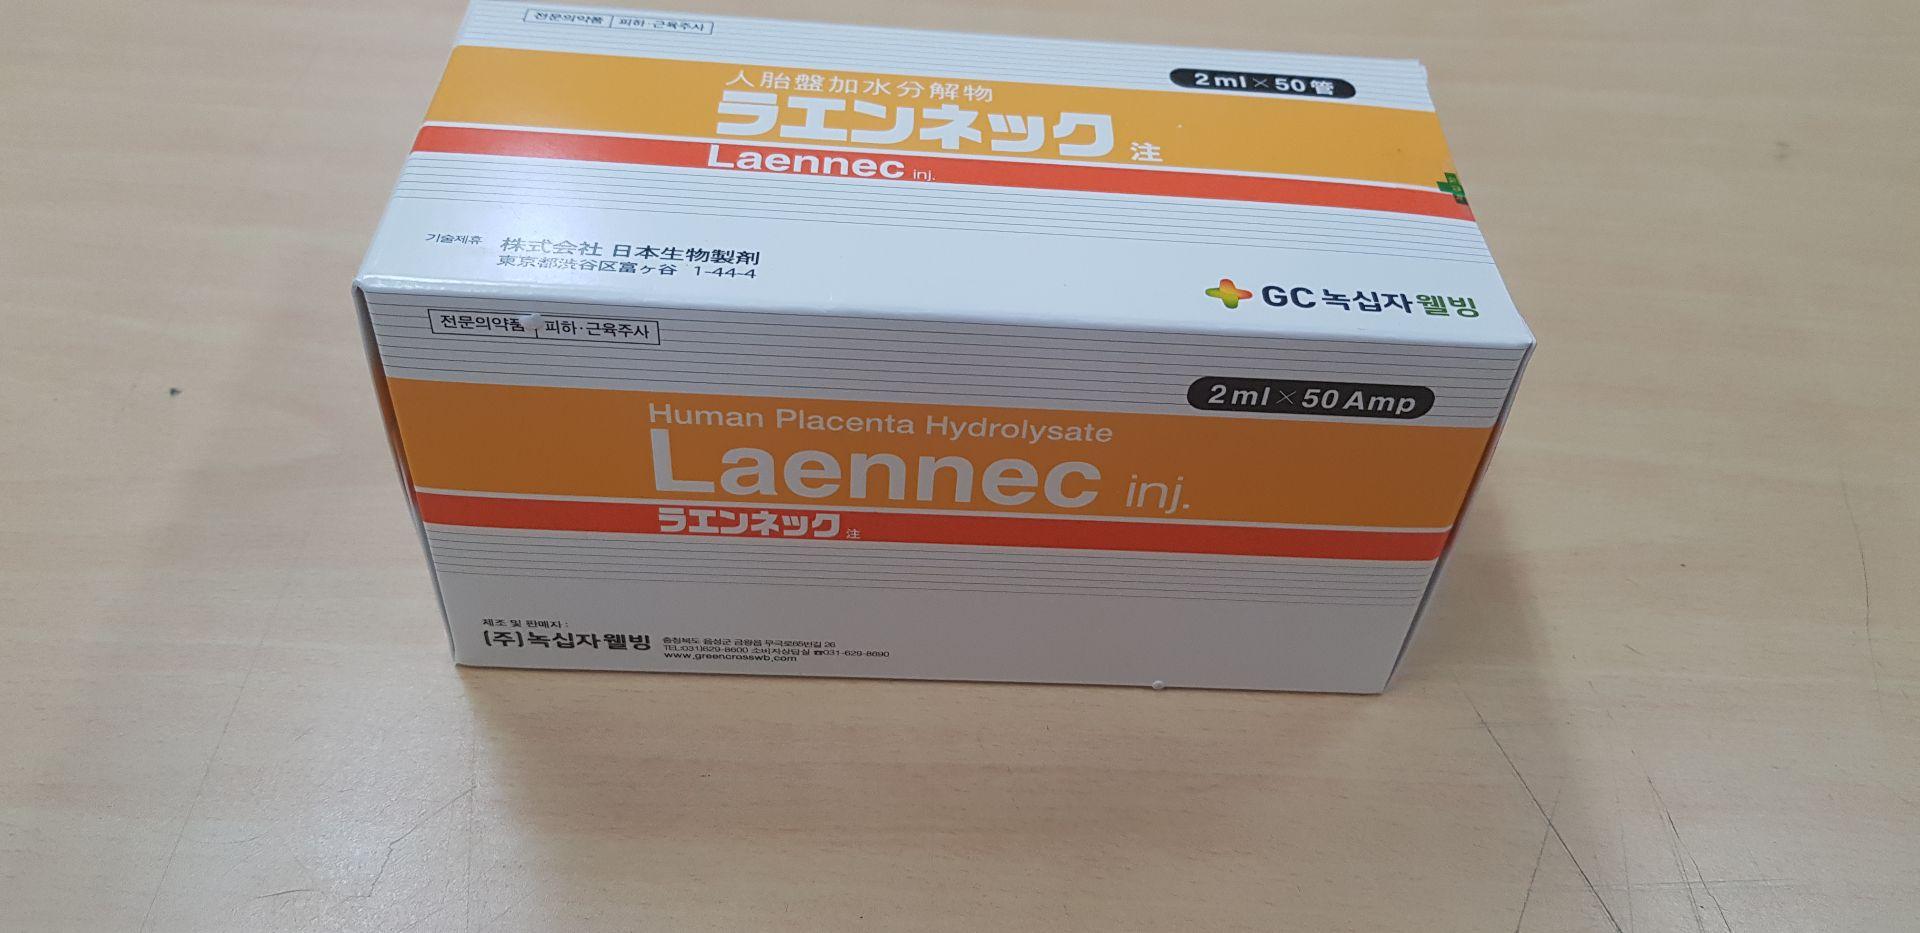 Laennec (2ml50AMPS) Human Placenta Whitening Anti-Aging Repair